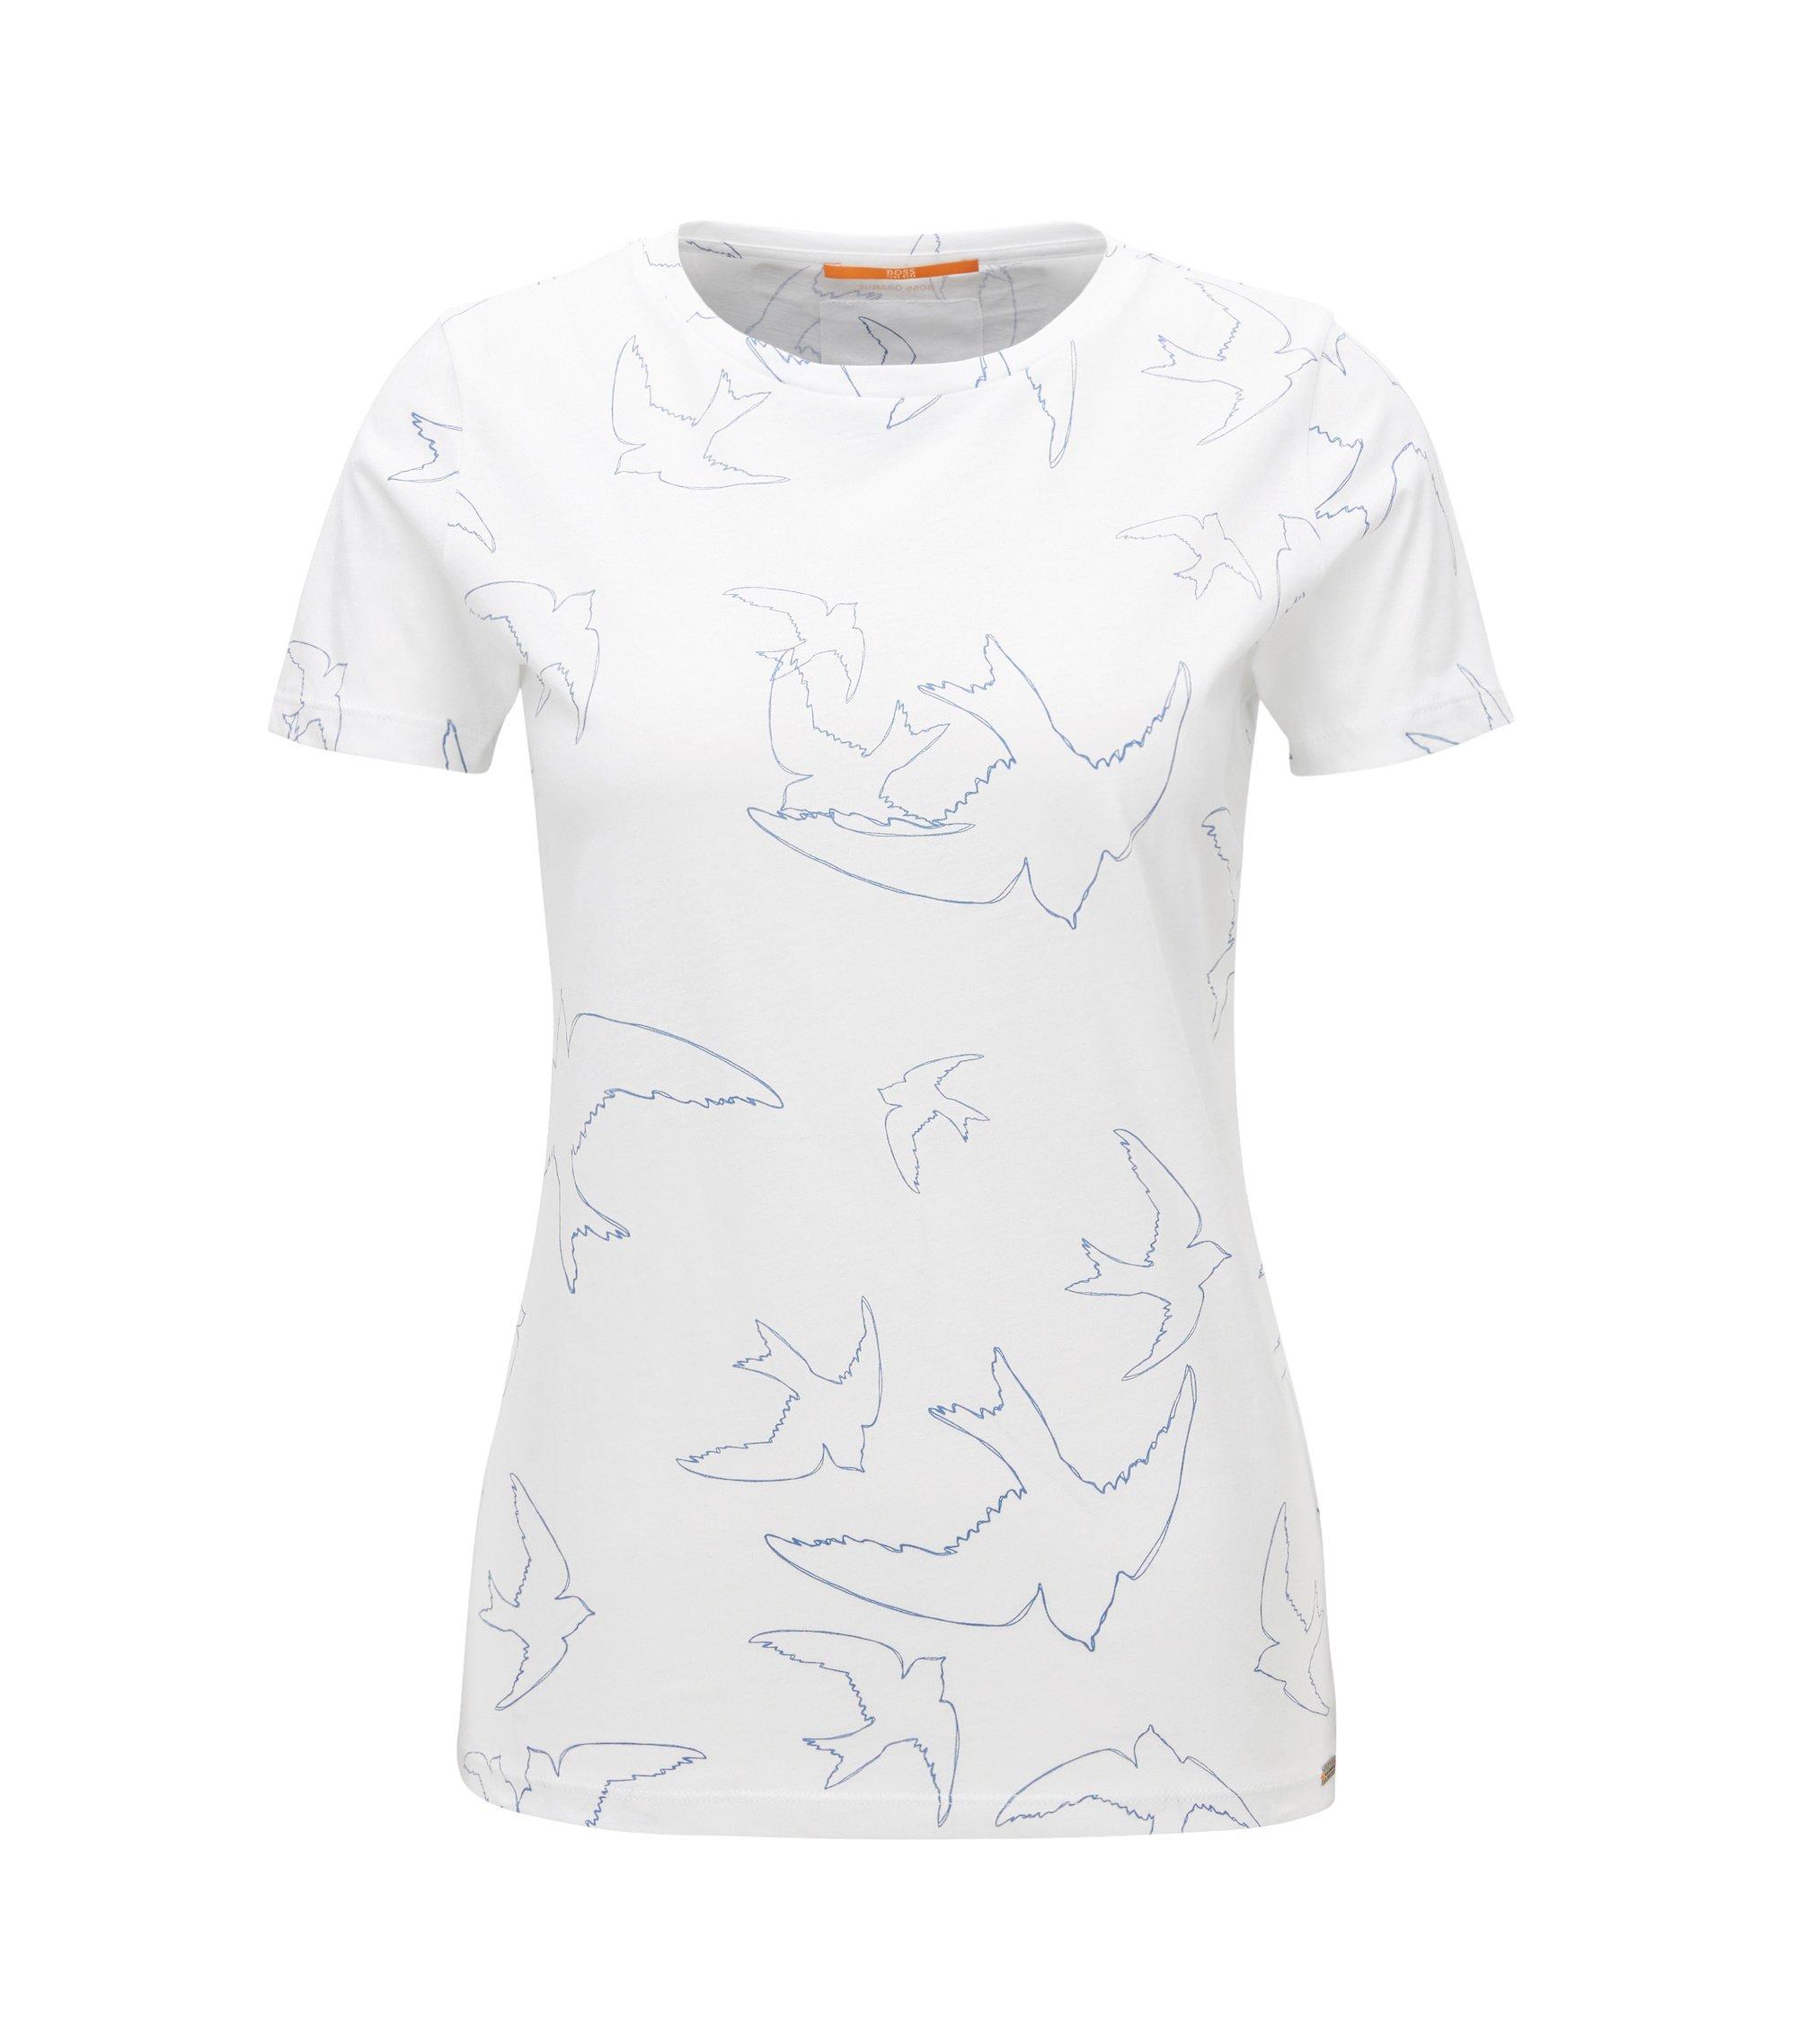 T-shirt slim fit in jersey singolo con motivo con uccelli , Bianco